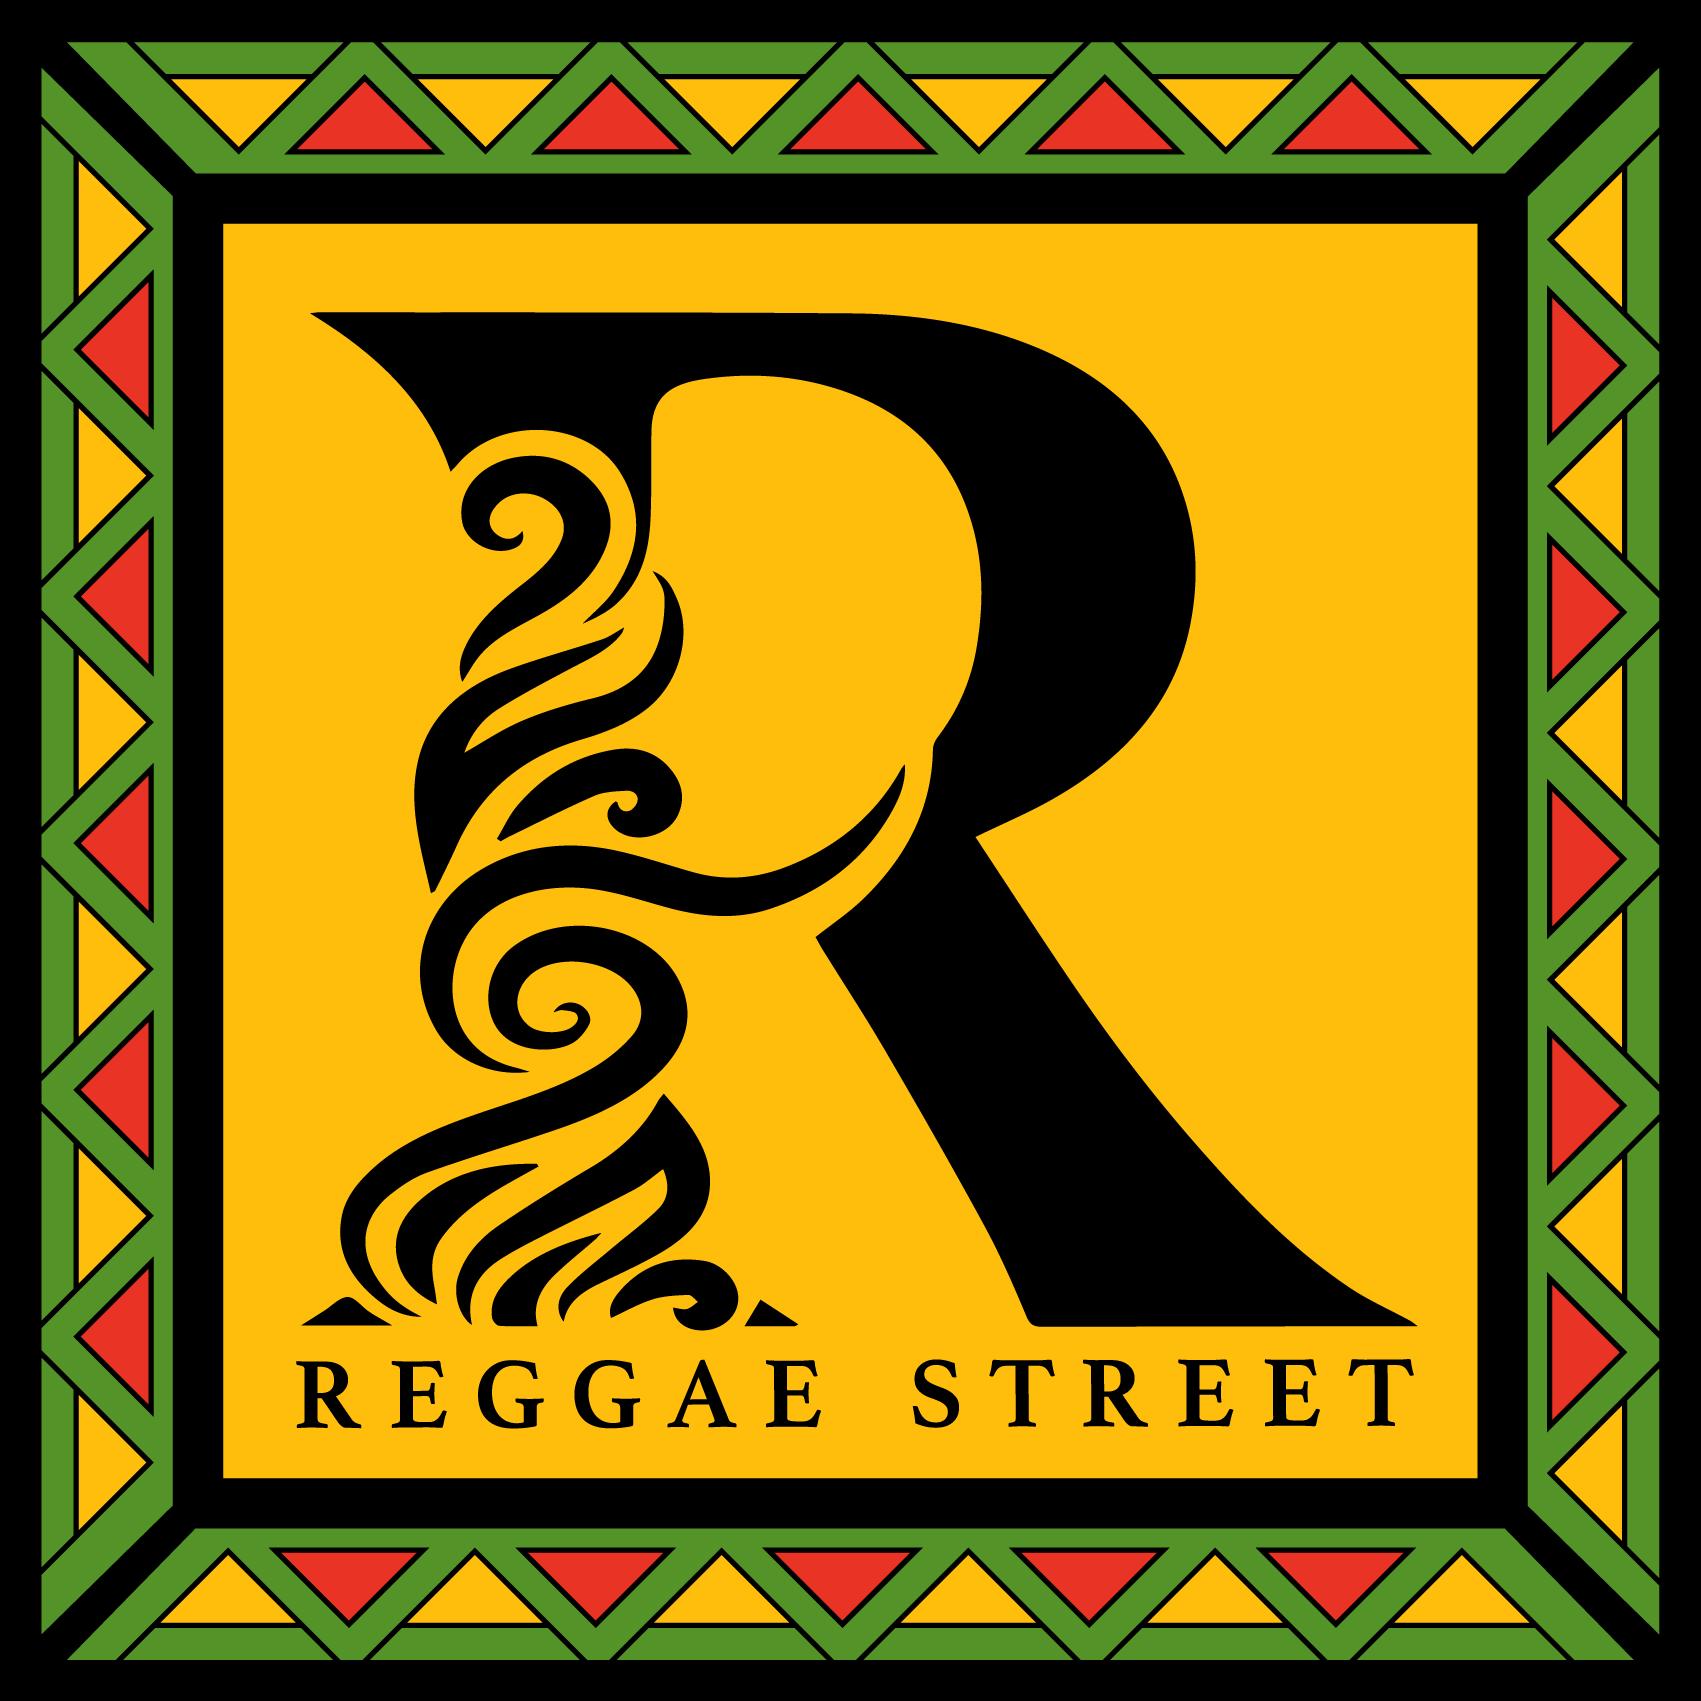 reggaestreet